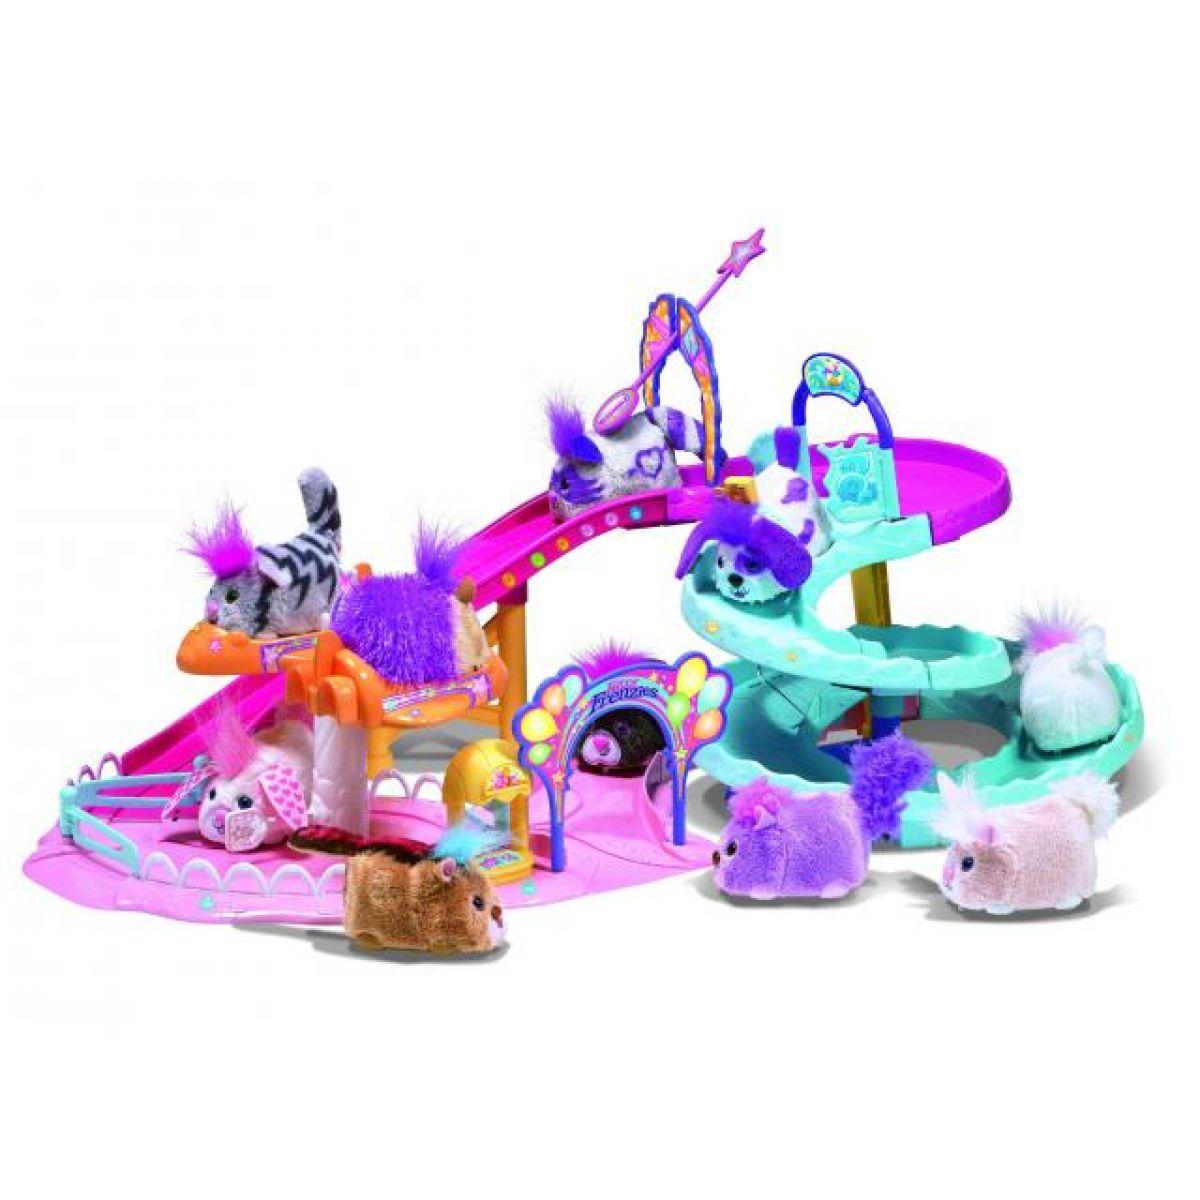 Furry Frenzies velká hrací sada s tobogánem a se zvířátkem Furreal Friends 32808